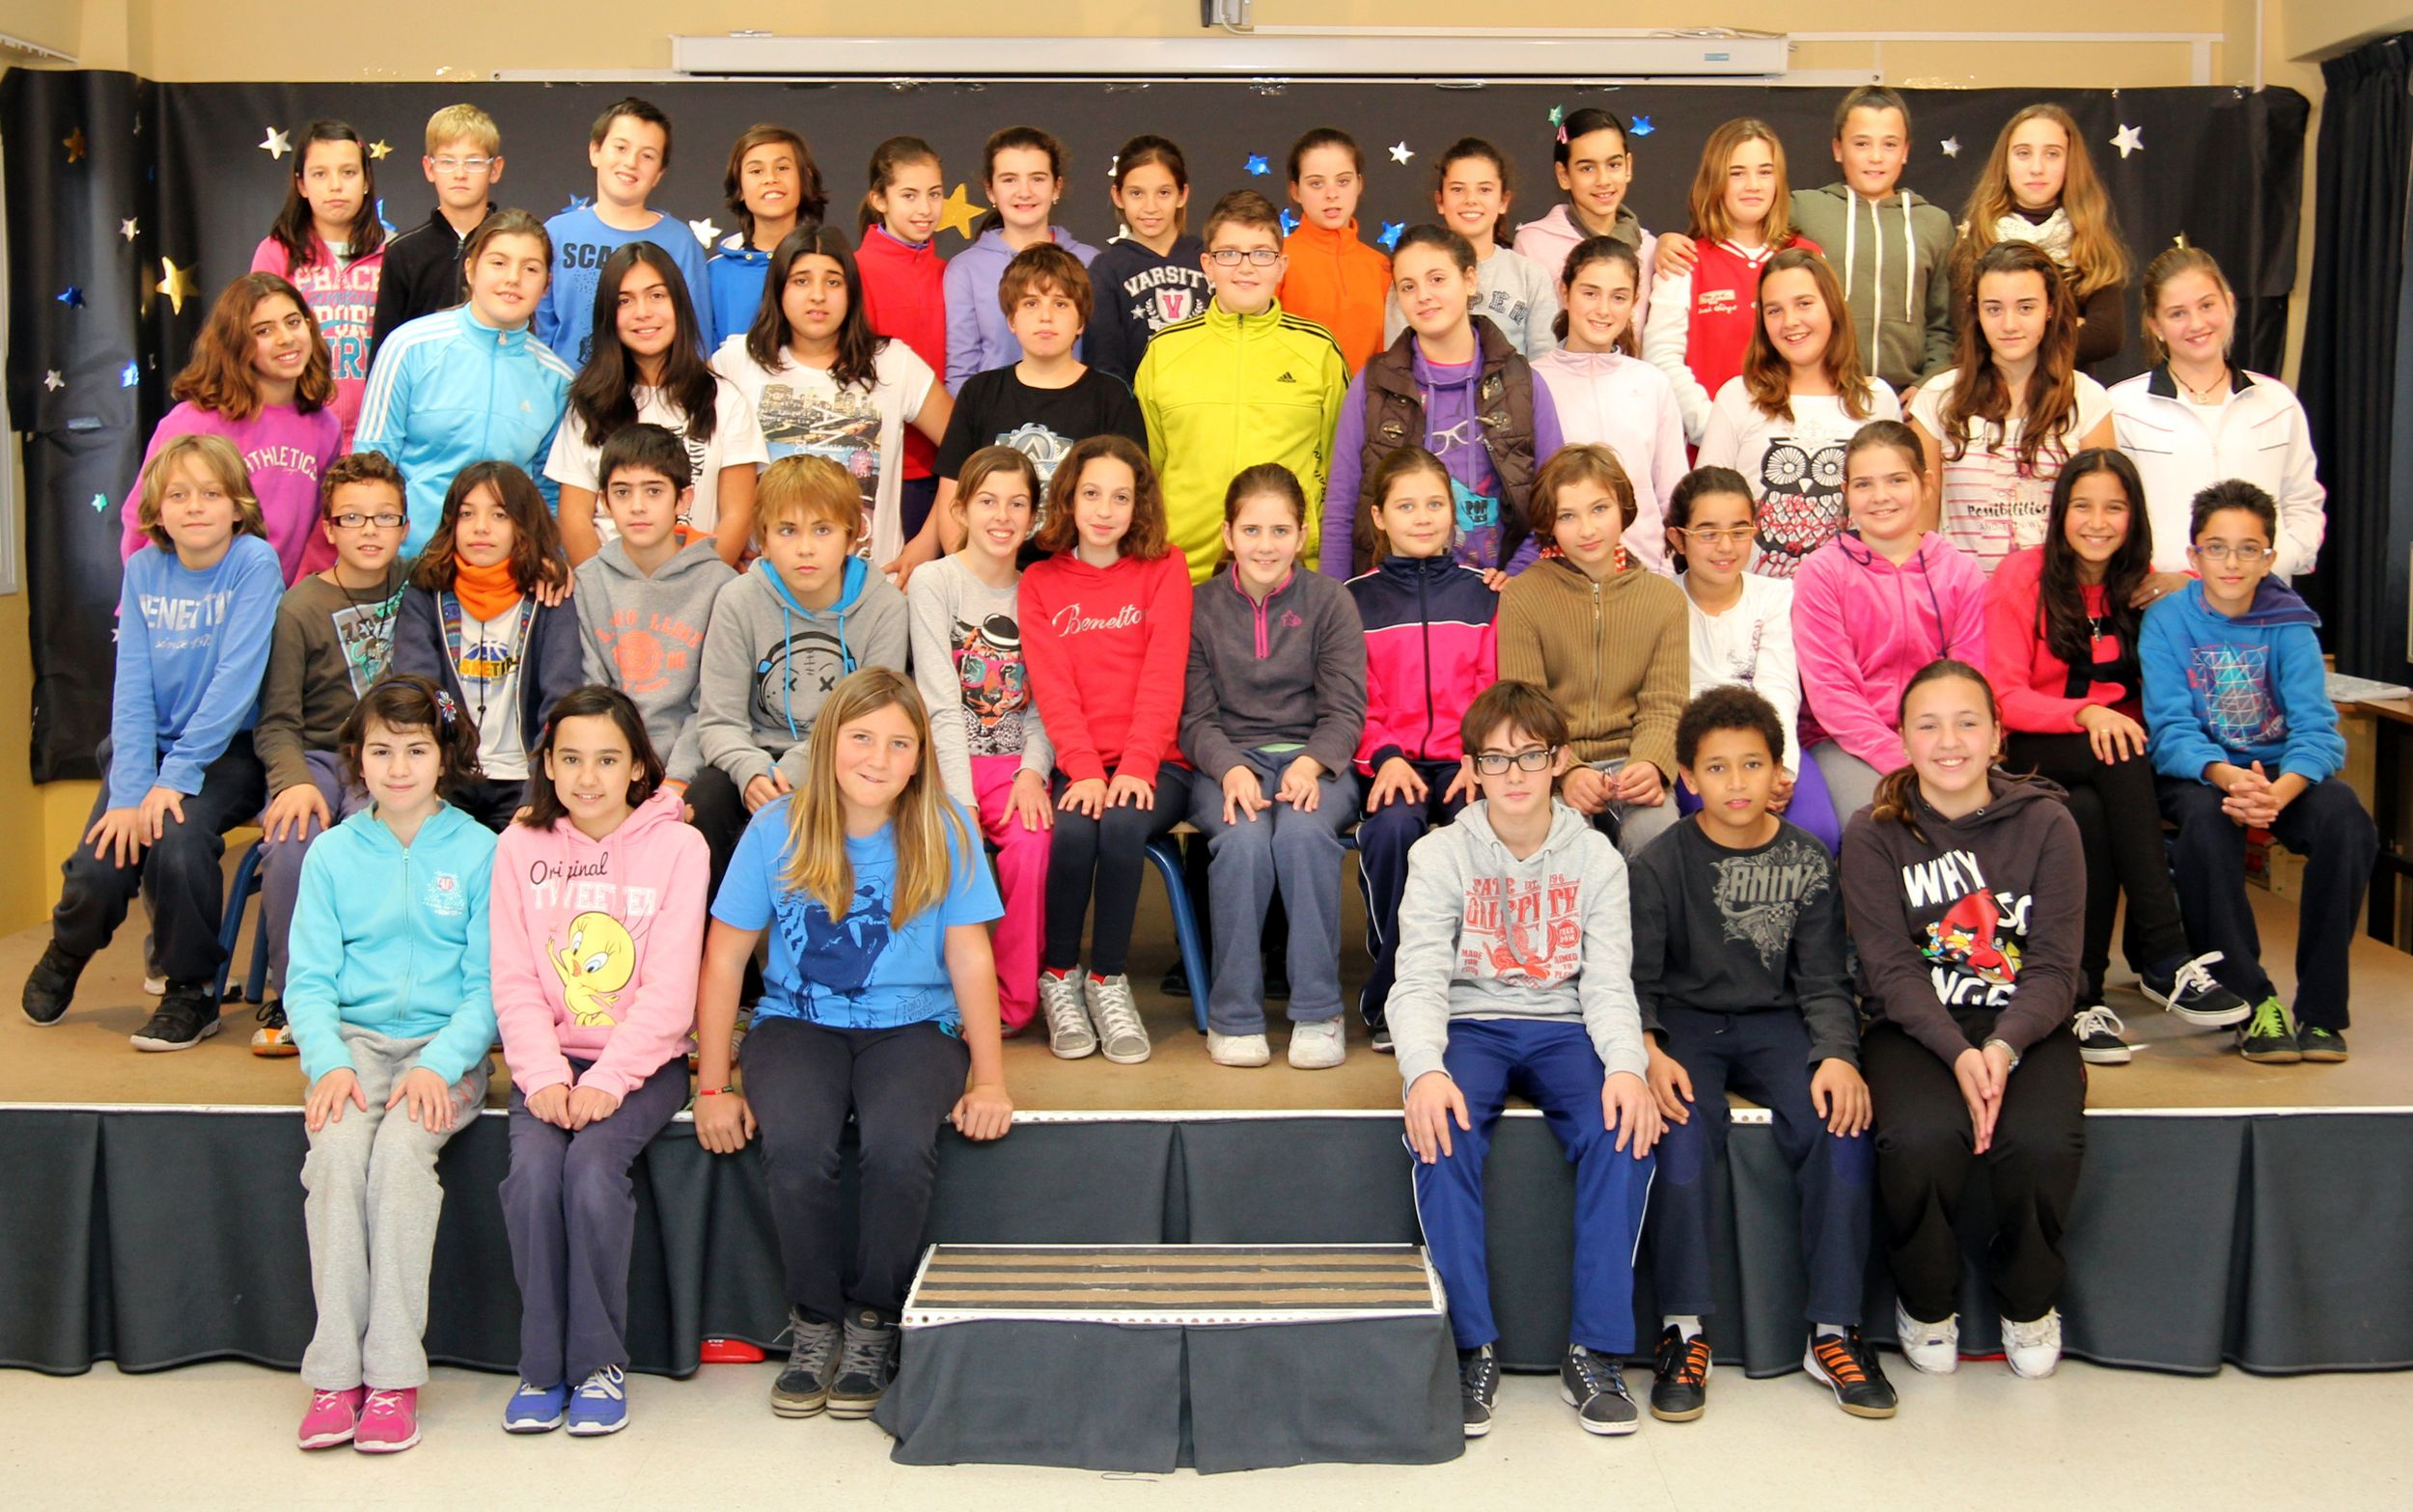 XXII Muestra de Teatro de Centros Docentes: CEIP Mariana Pineda ' Jesucristo Super Star'